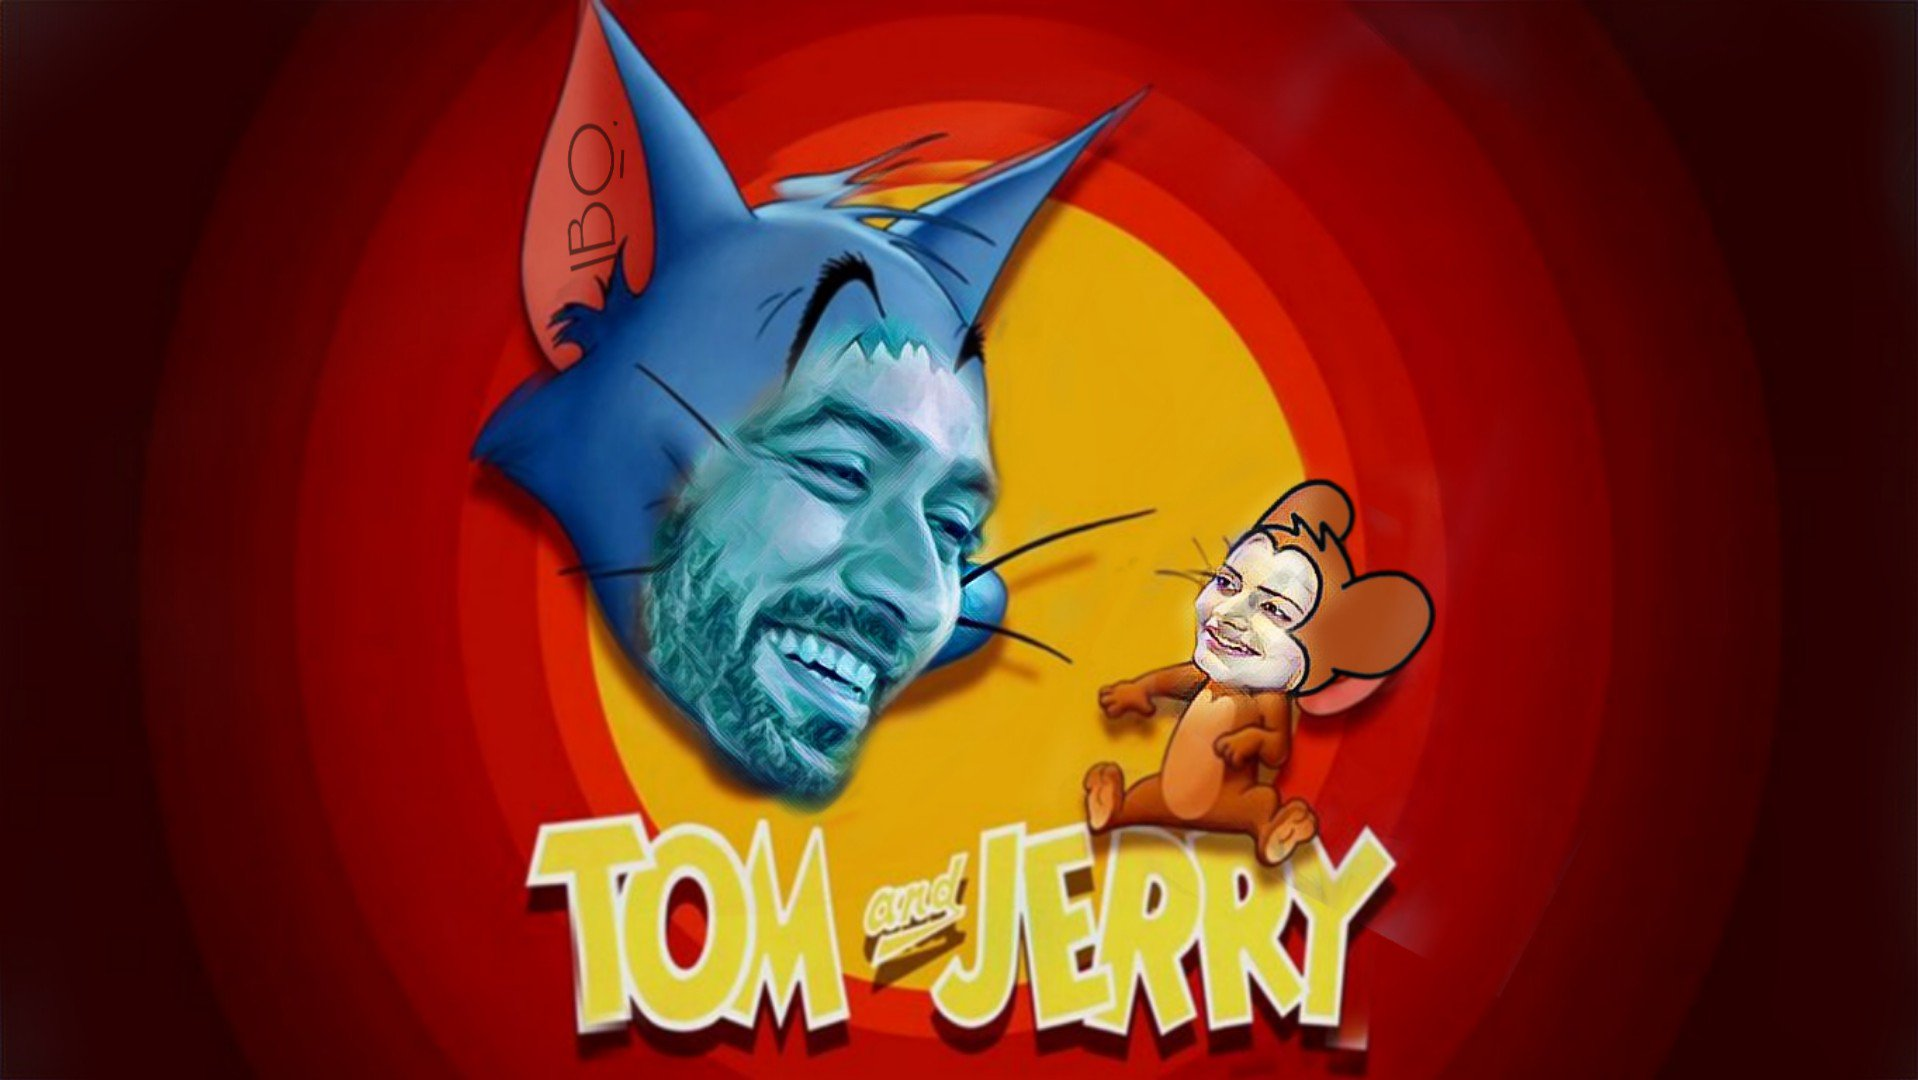 Tom and Jerry 2.0 ������������ @NakuulMehta @SurbhiChandna  #ITA2018 #SPA2018 #ishqbaaaz https://t.co/KpLzU2LTC3